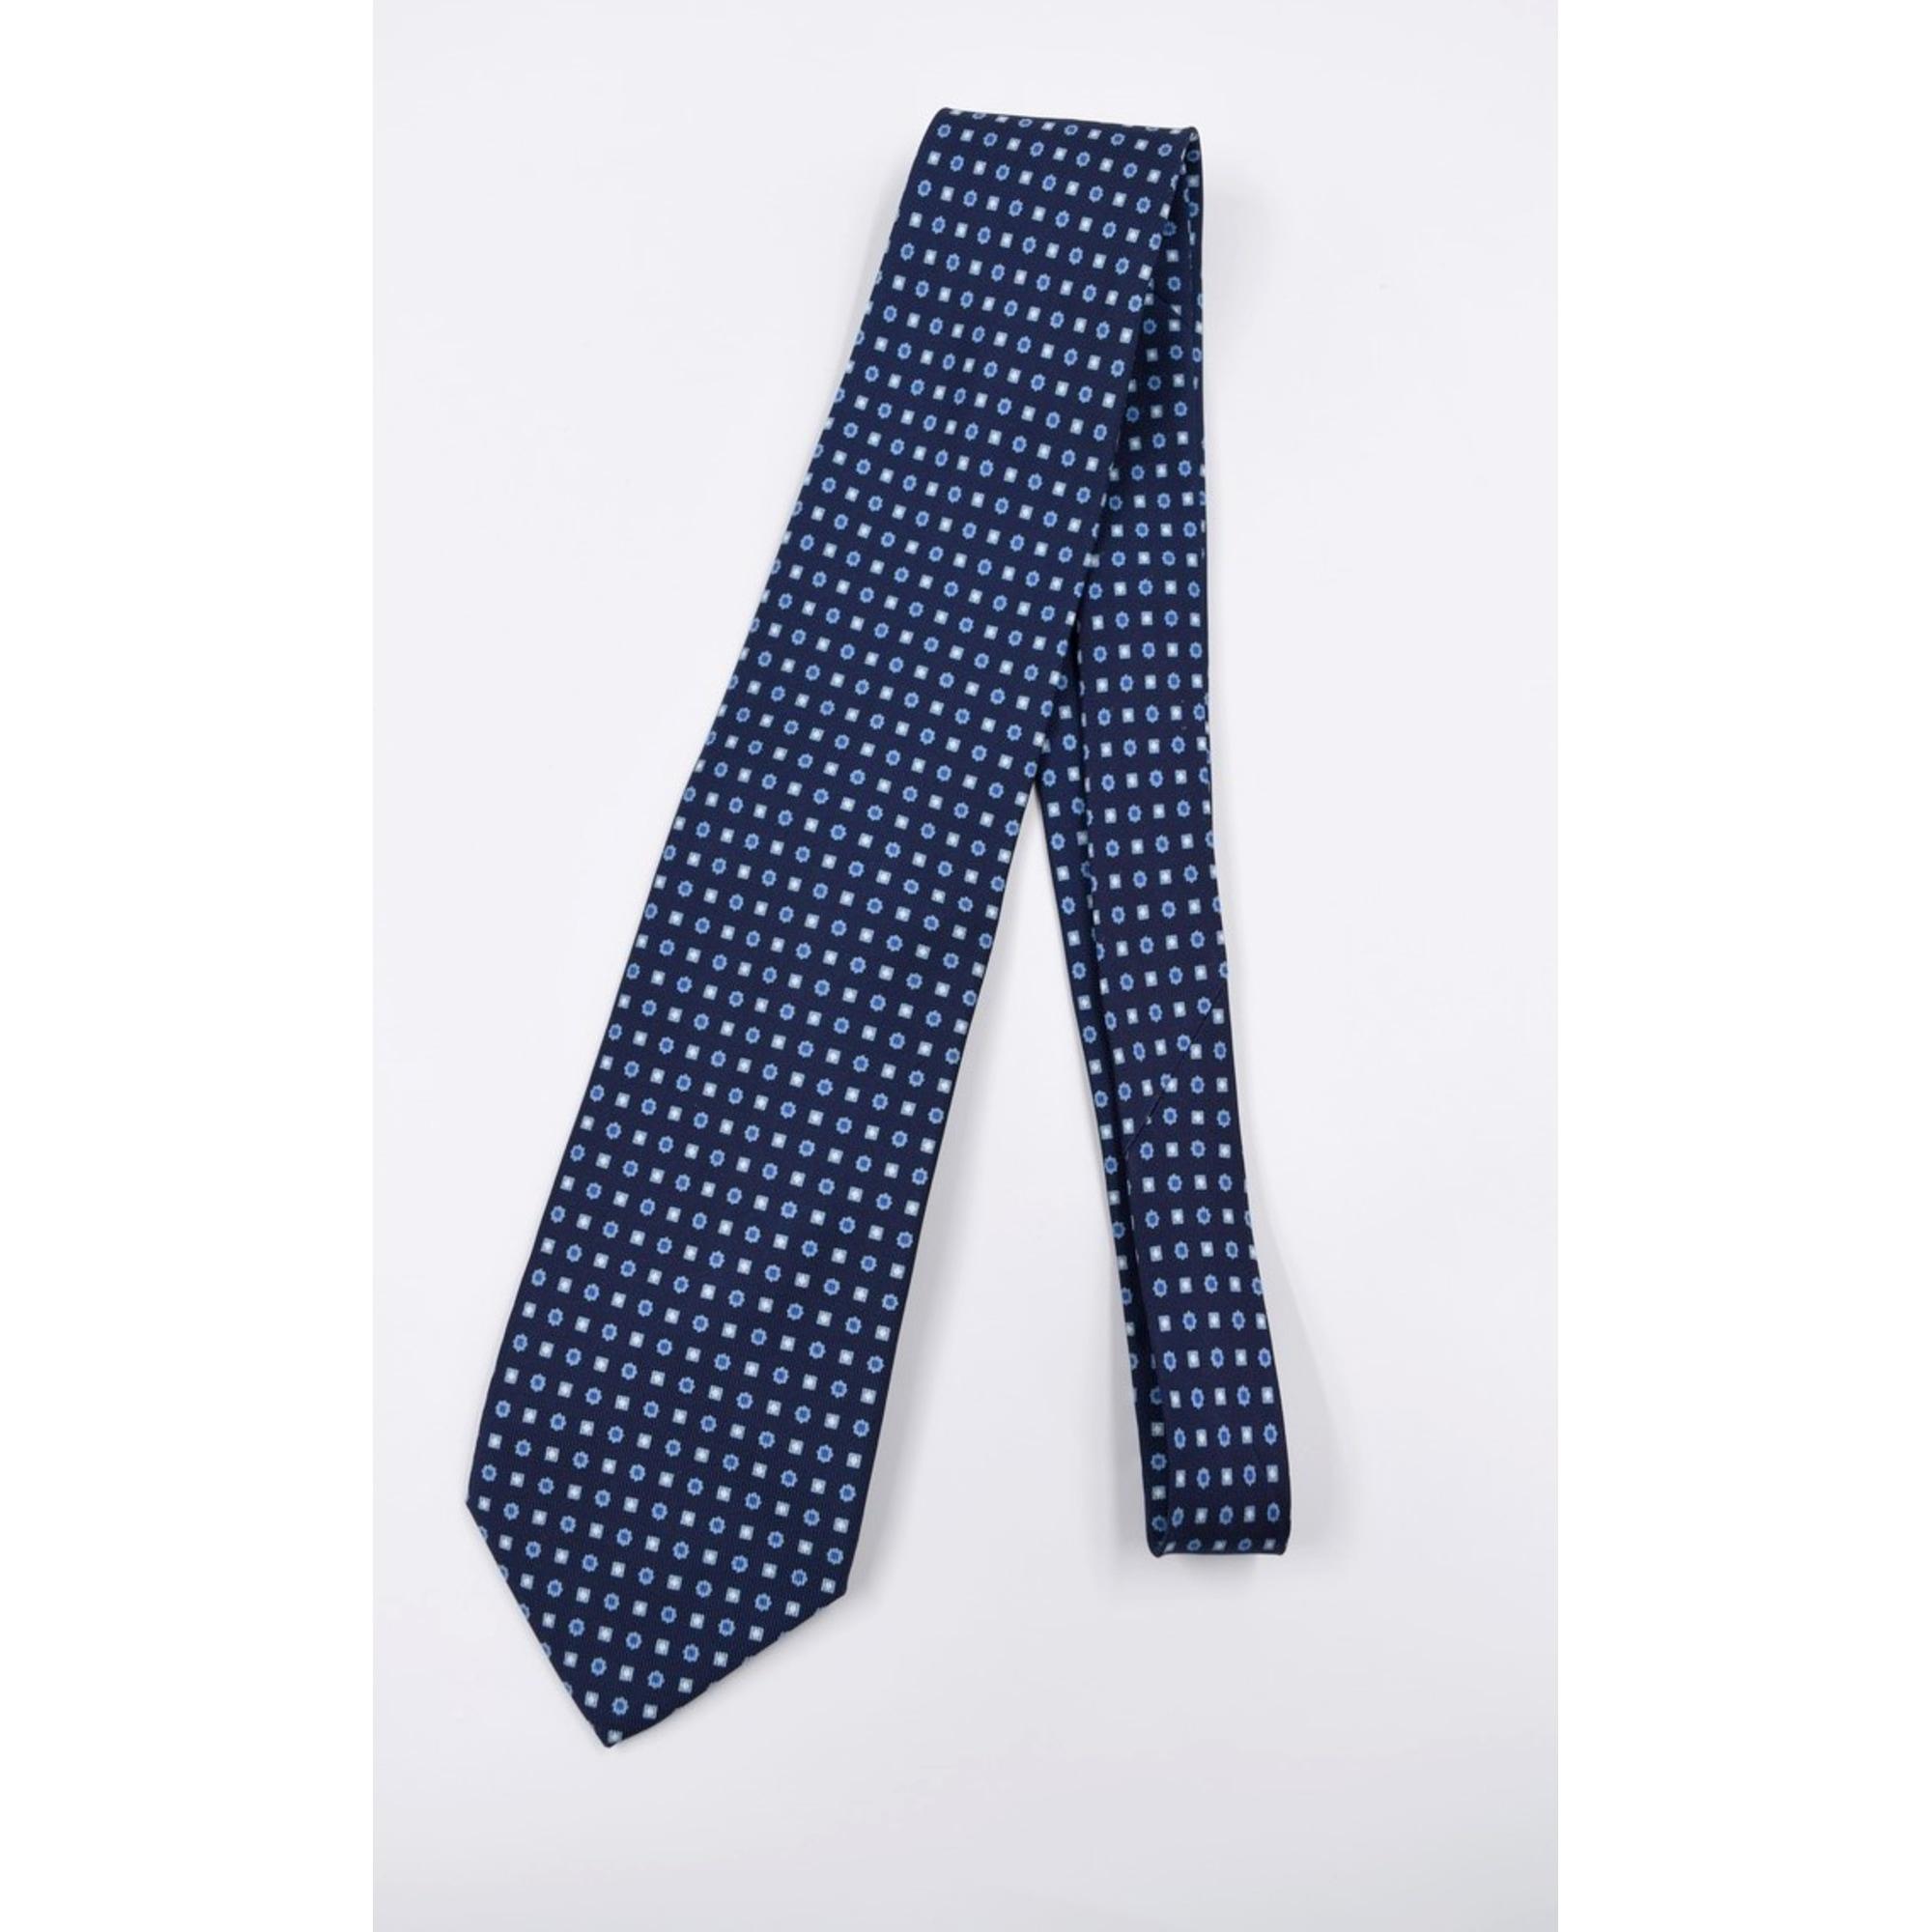 Cravate MARINELLA Bleu, bleu marine, bleu turquoise